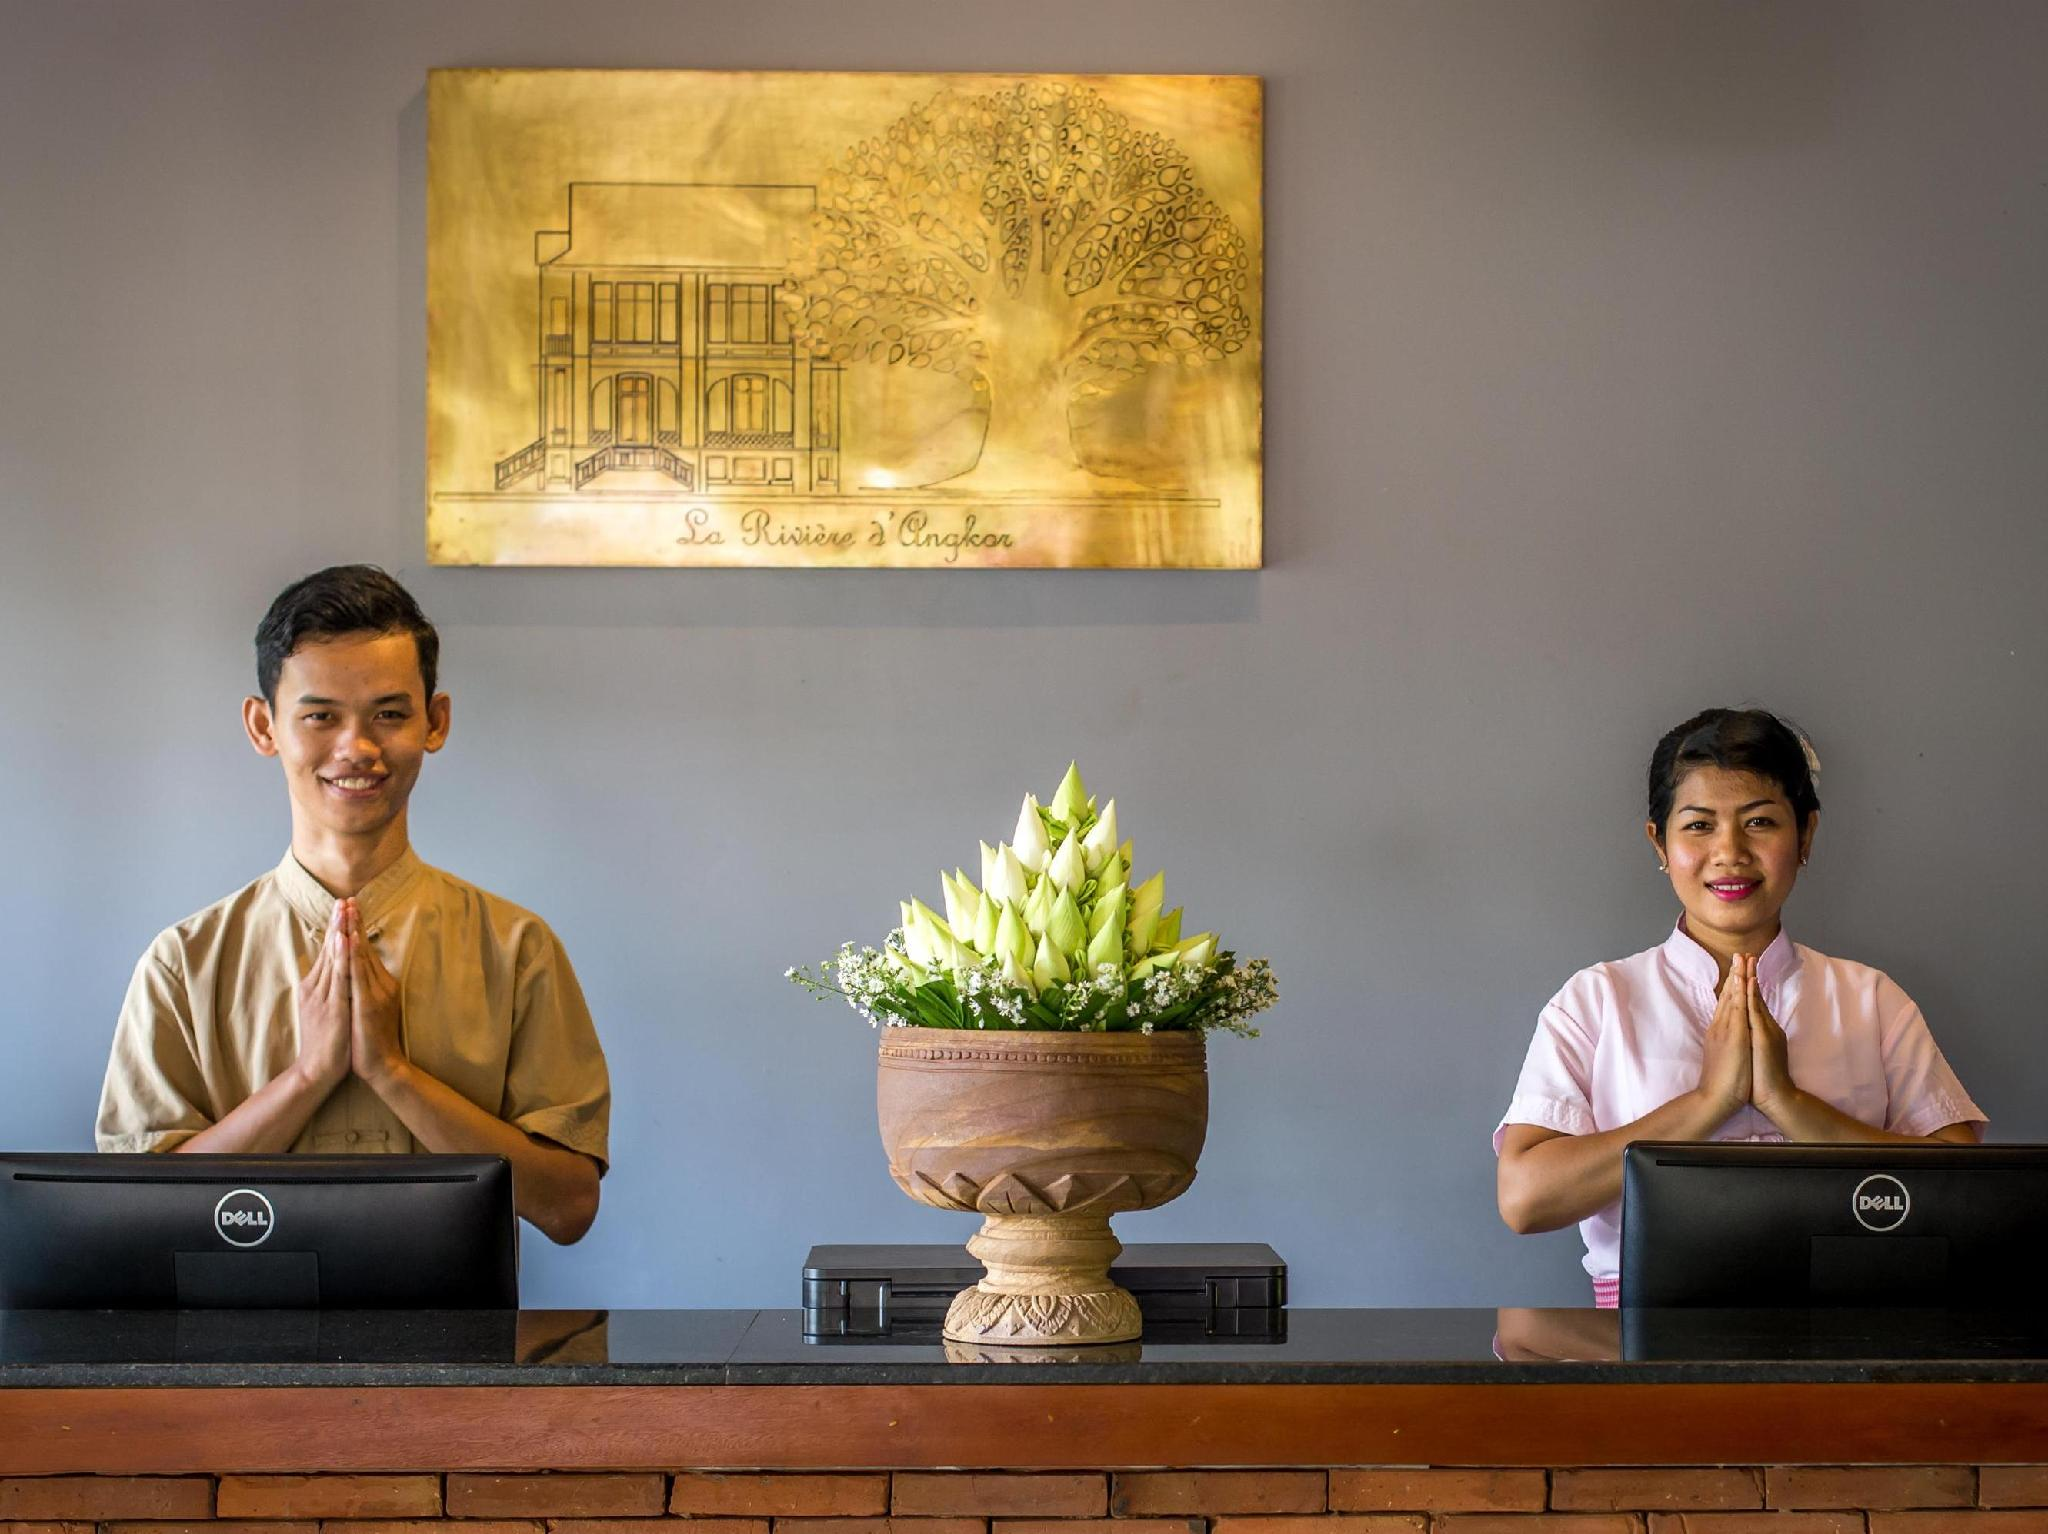 La Riviere d' Angkor Resort14